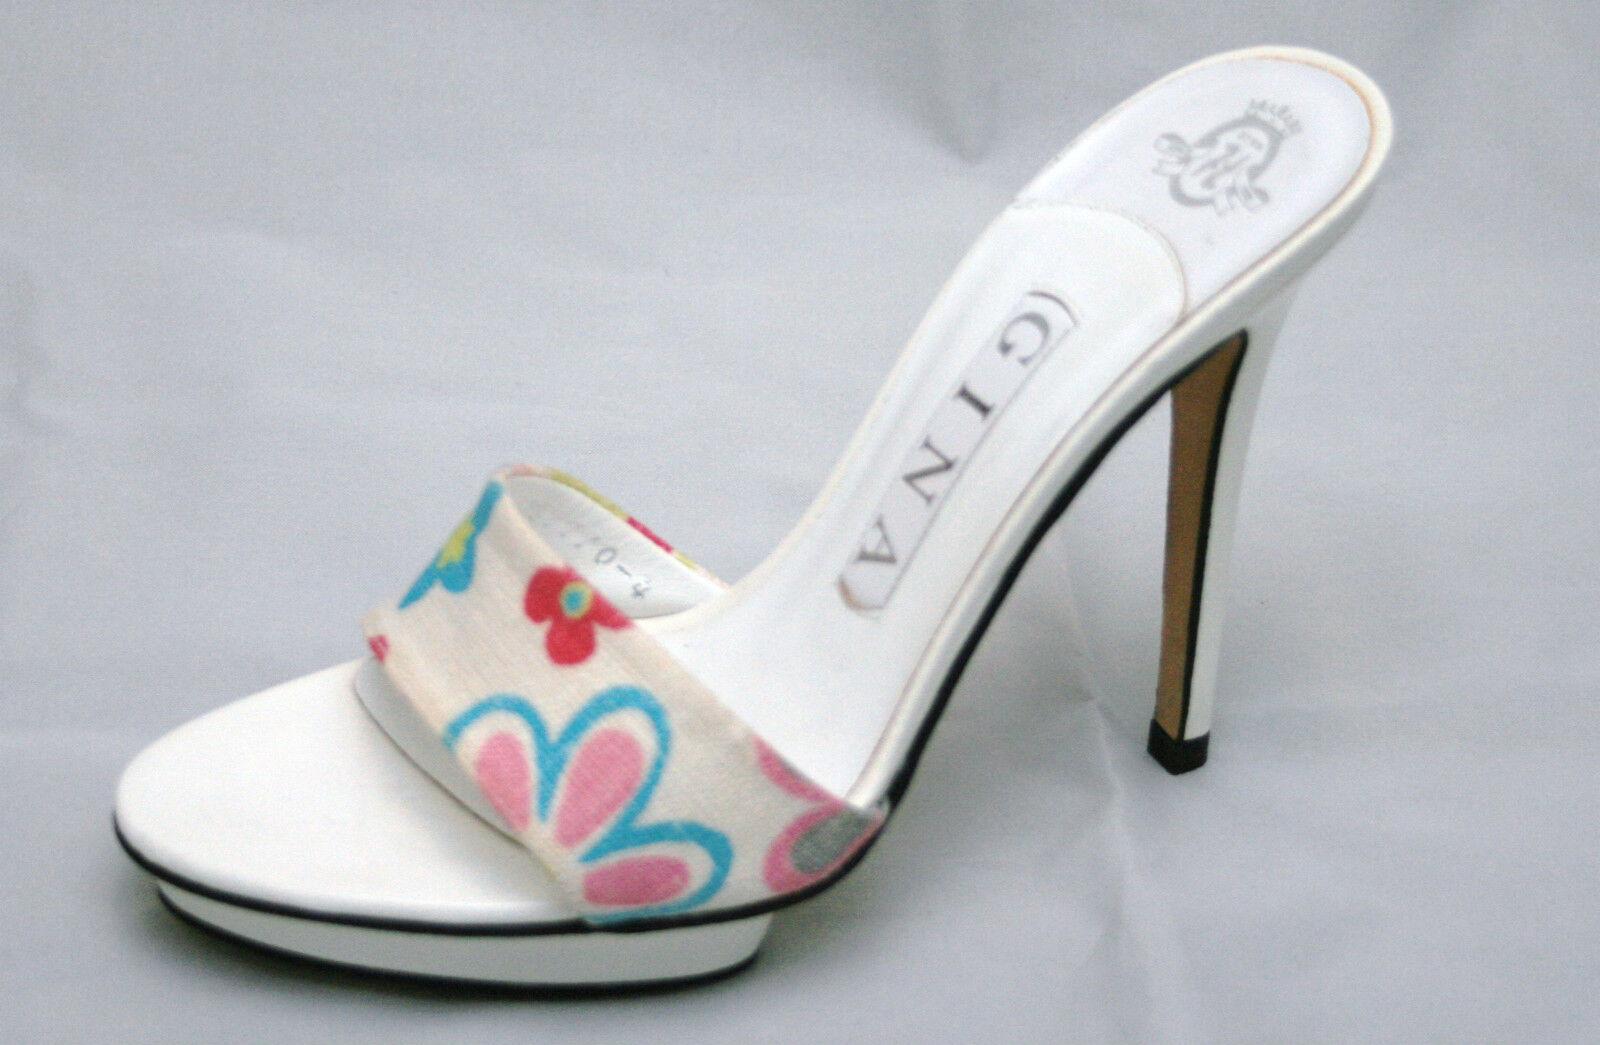 Gina white/floral print platform mules, UK 3.5/EU 36.5, BNWB, RRP £325 3455